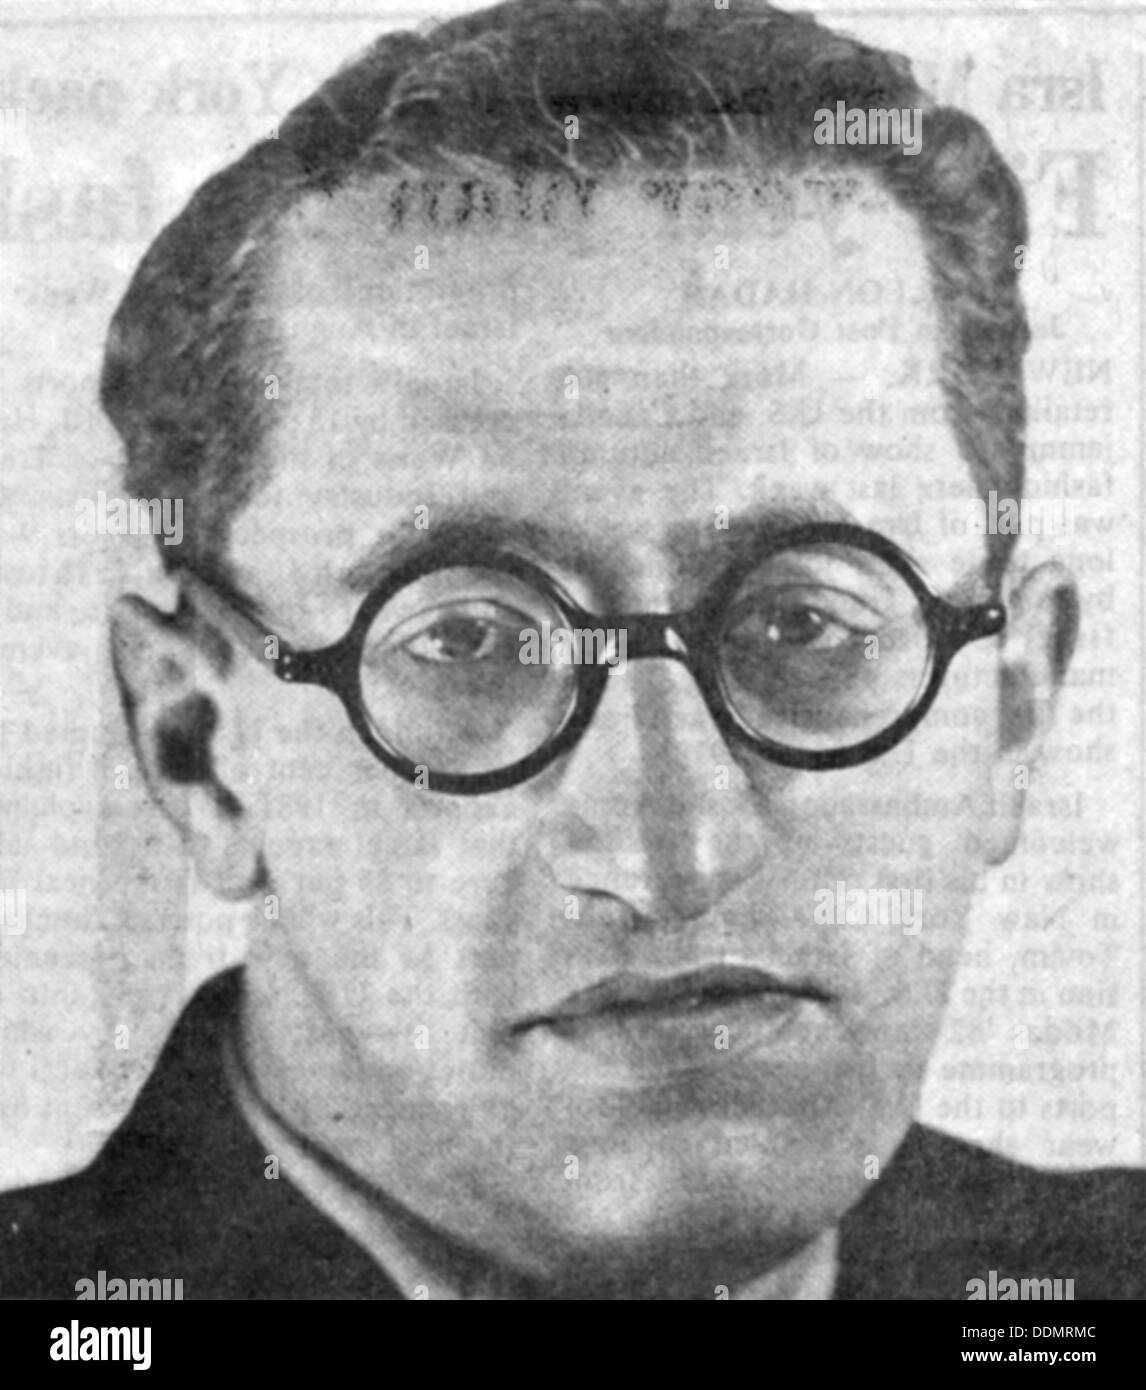 Viktor (Haim) Arlosoroff, Jewish law student who had an affair with Magda Goebbels, 1929. - Stock Image